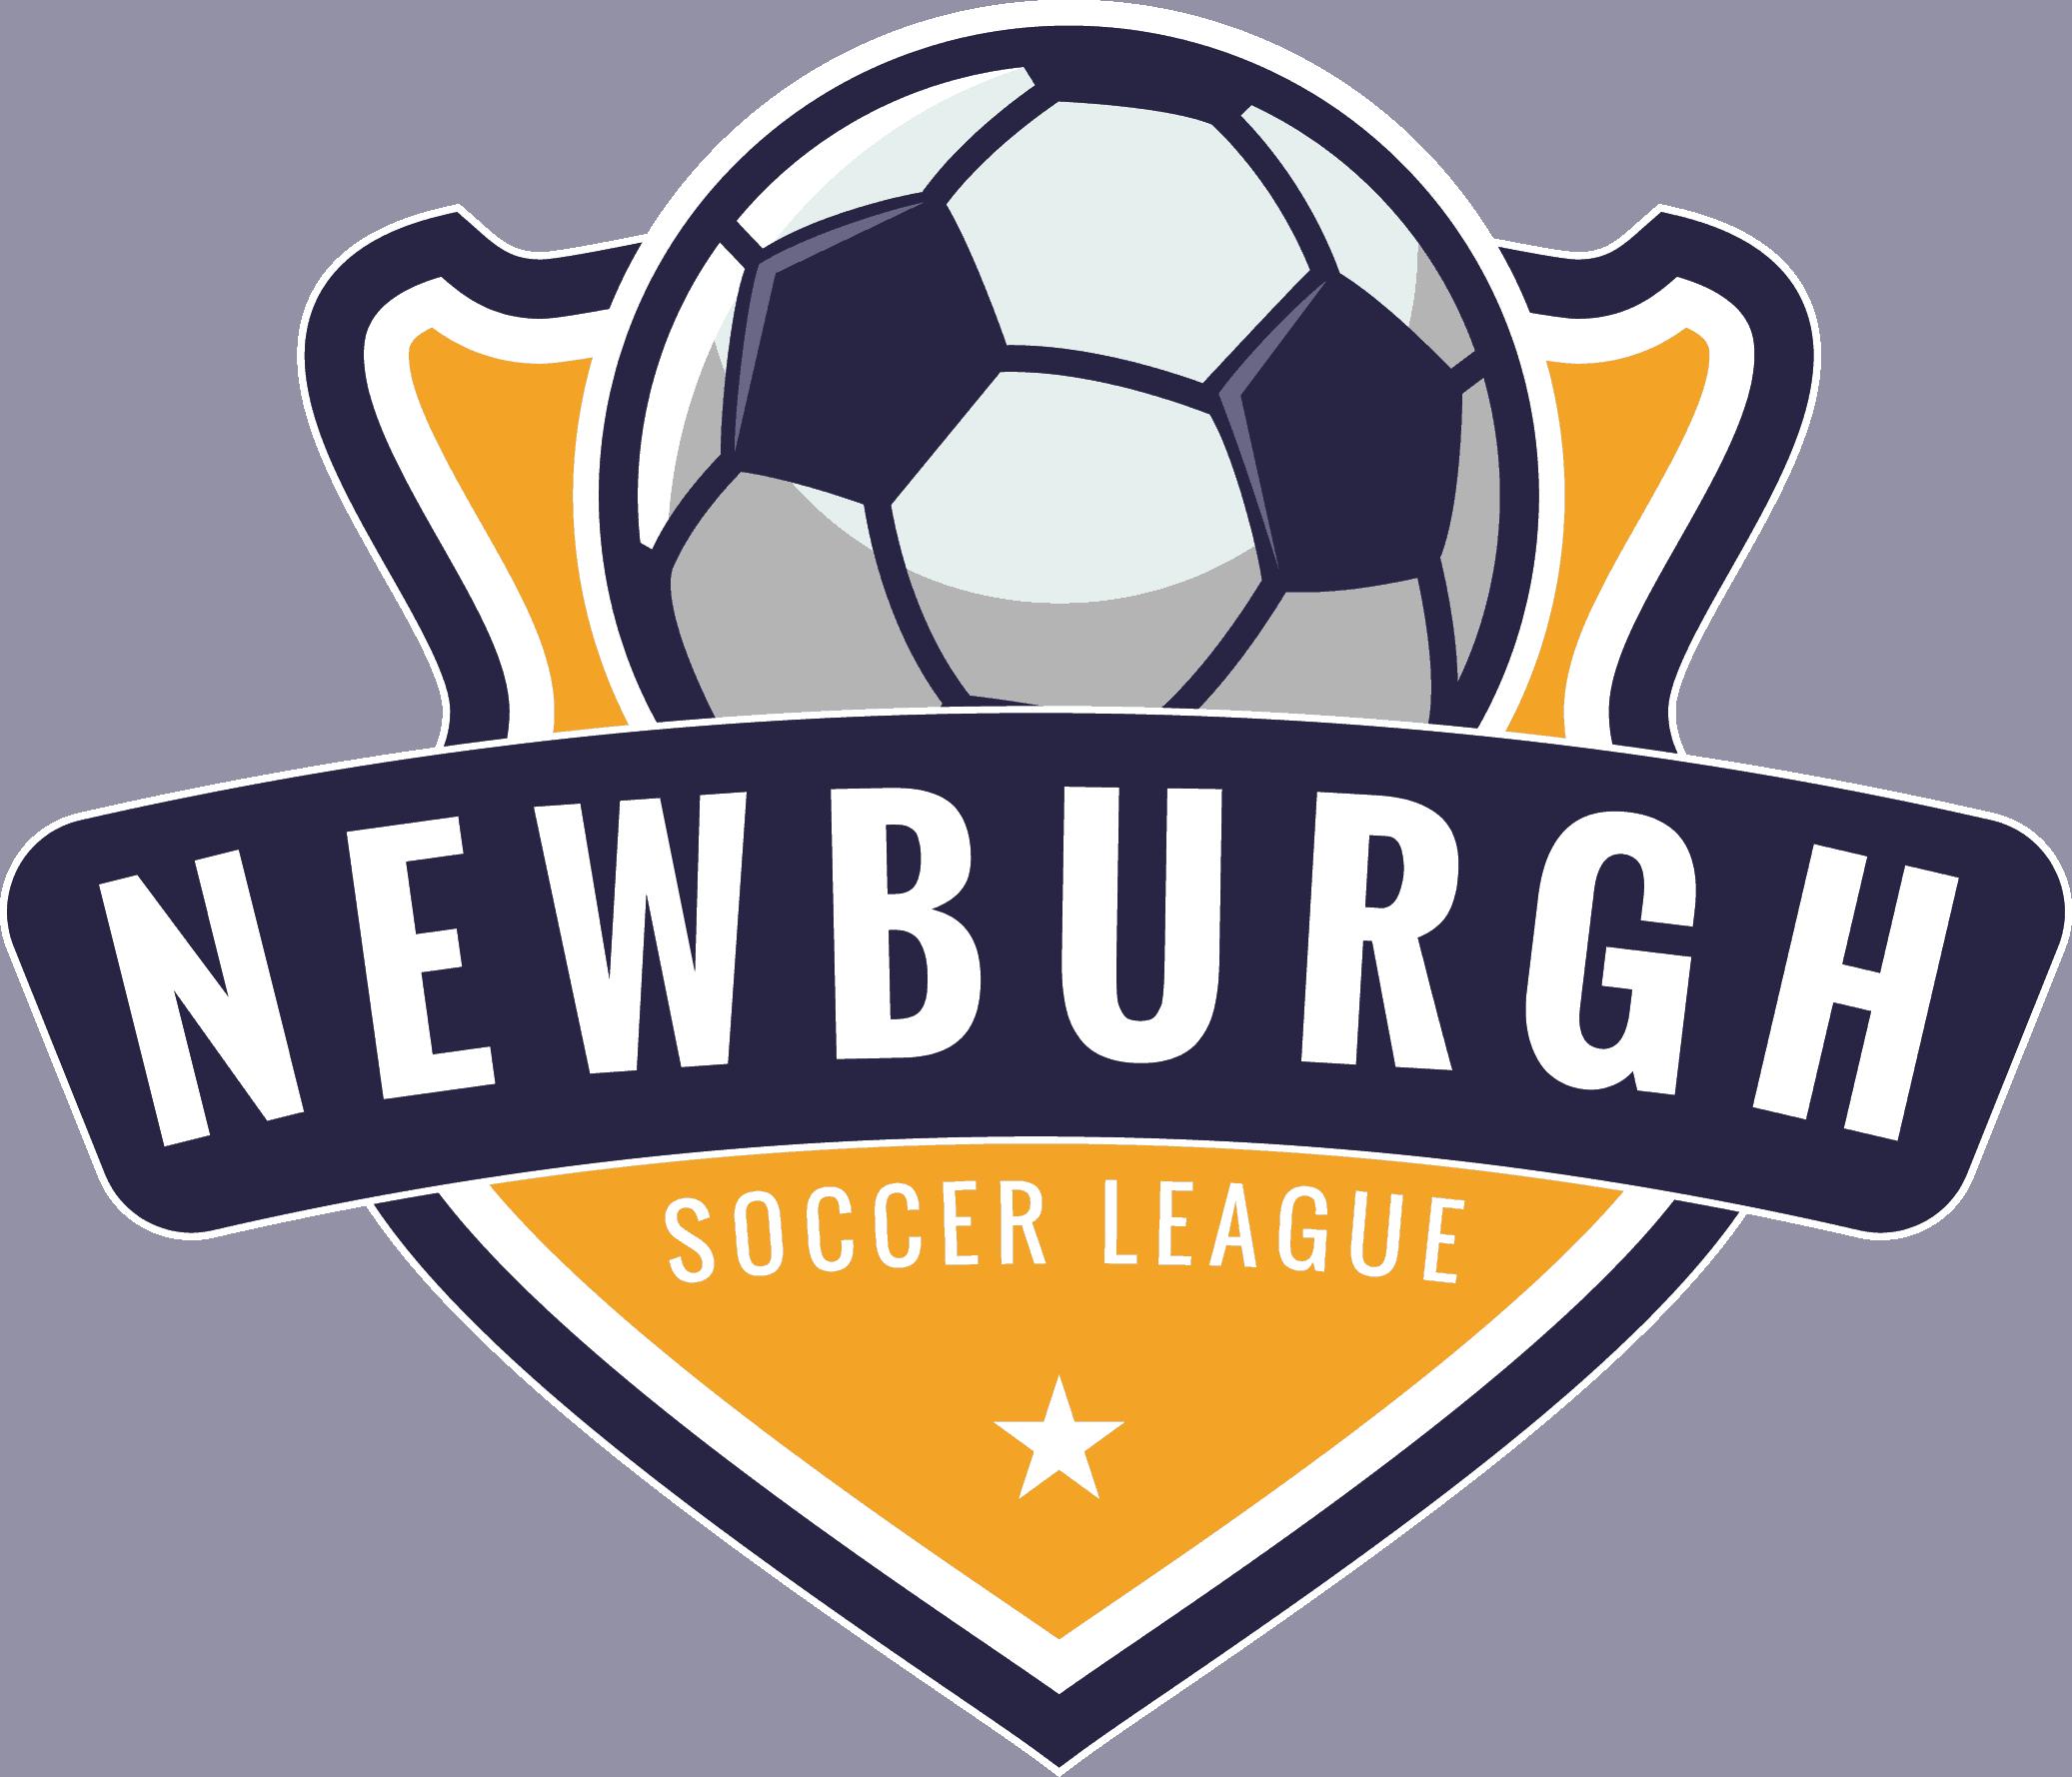 Newburgh Soccer League